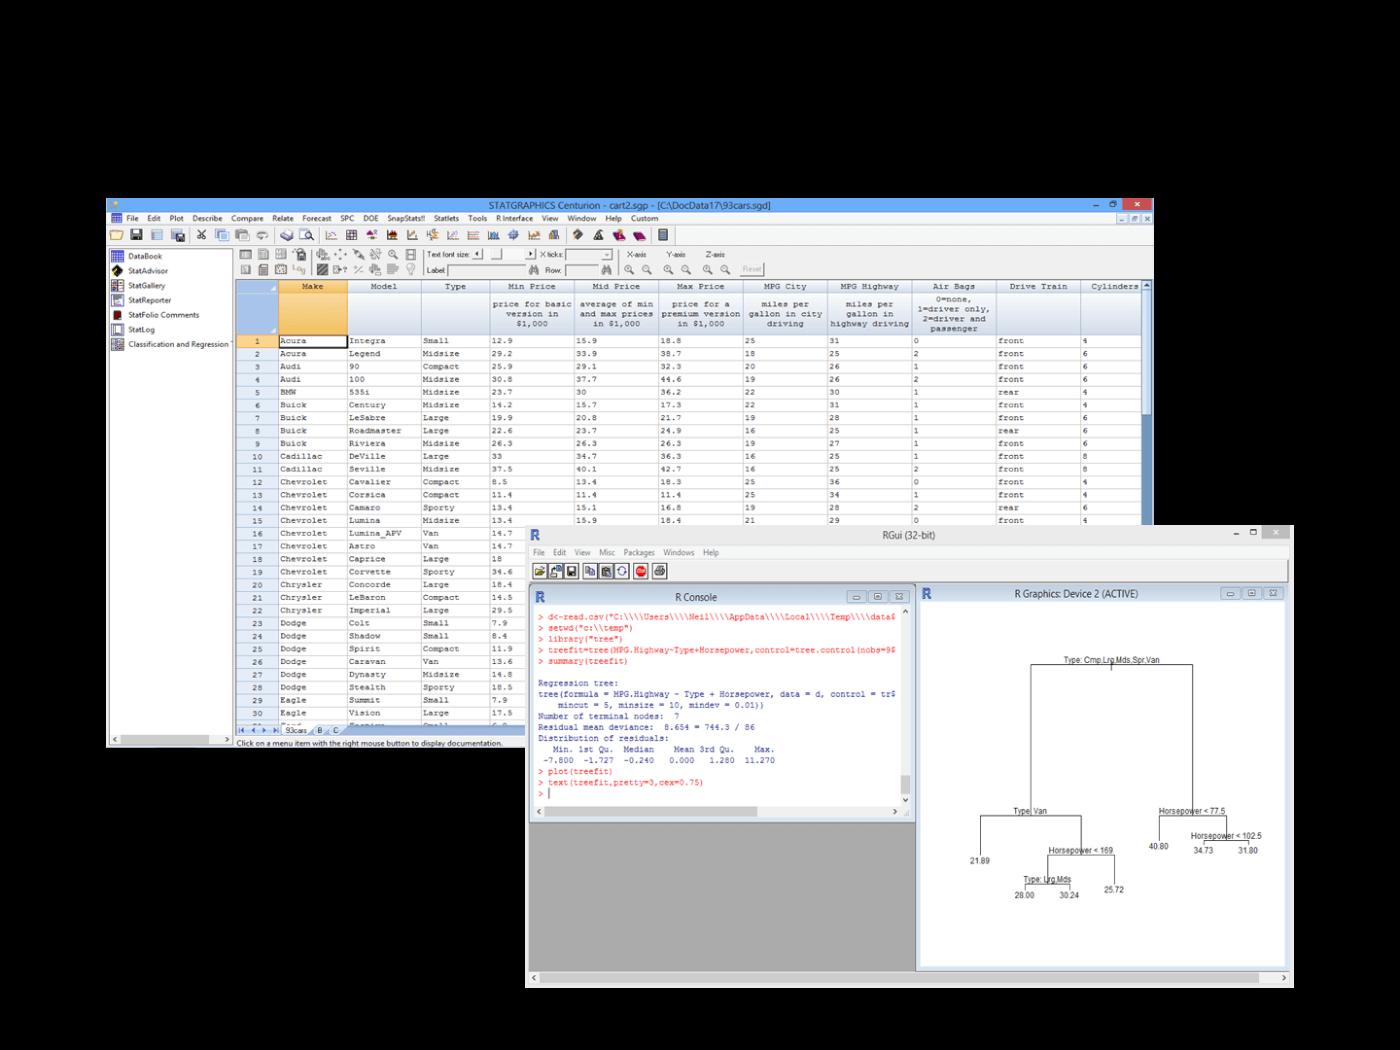 Statgraphics Centurion Standard deviation, Freeware